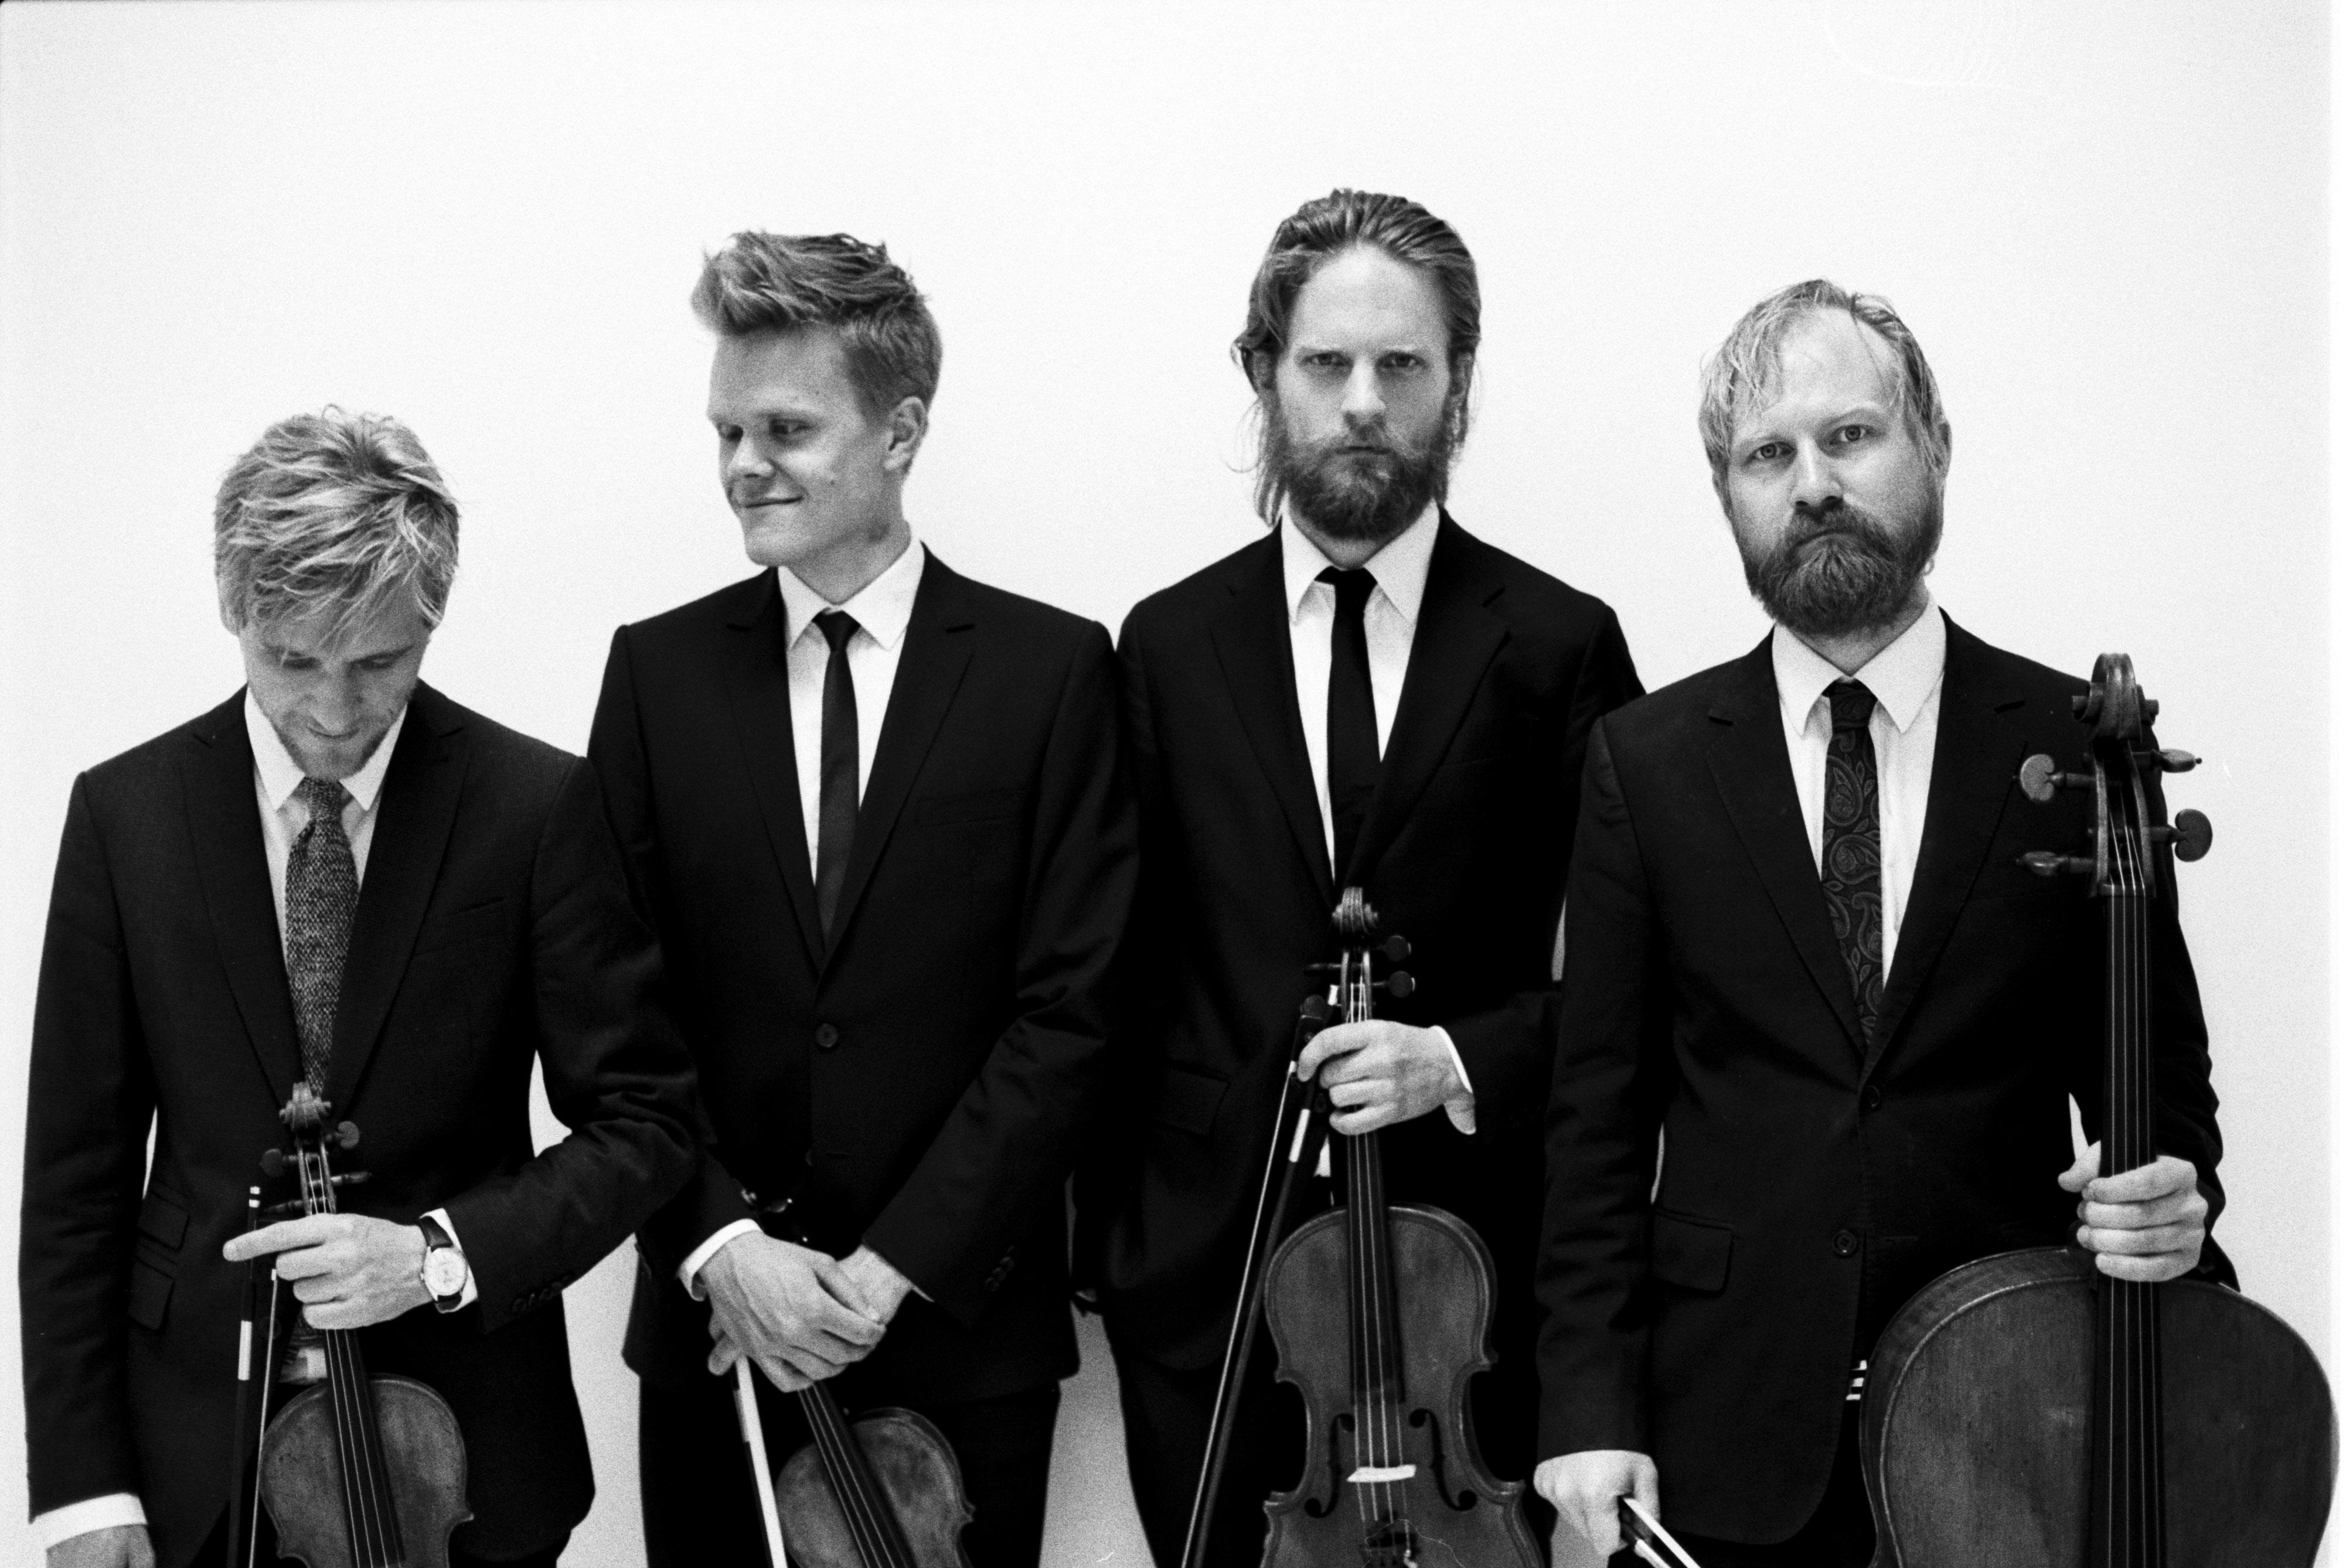 Danish String Quartett (c) Caroline Bittencourt